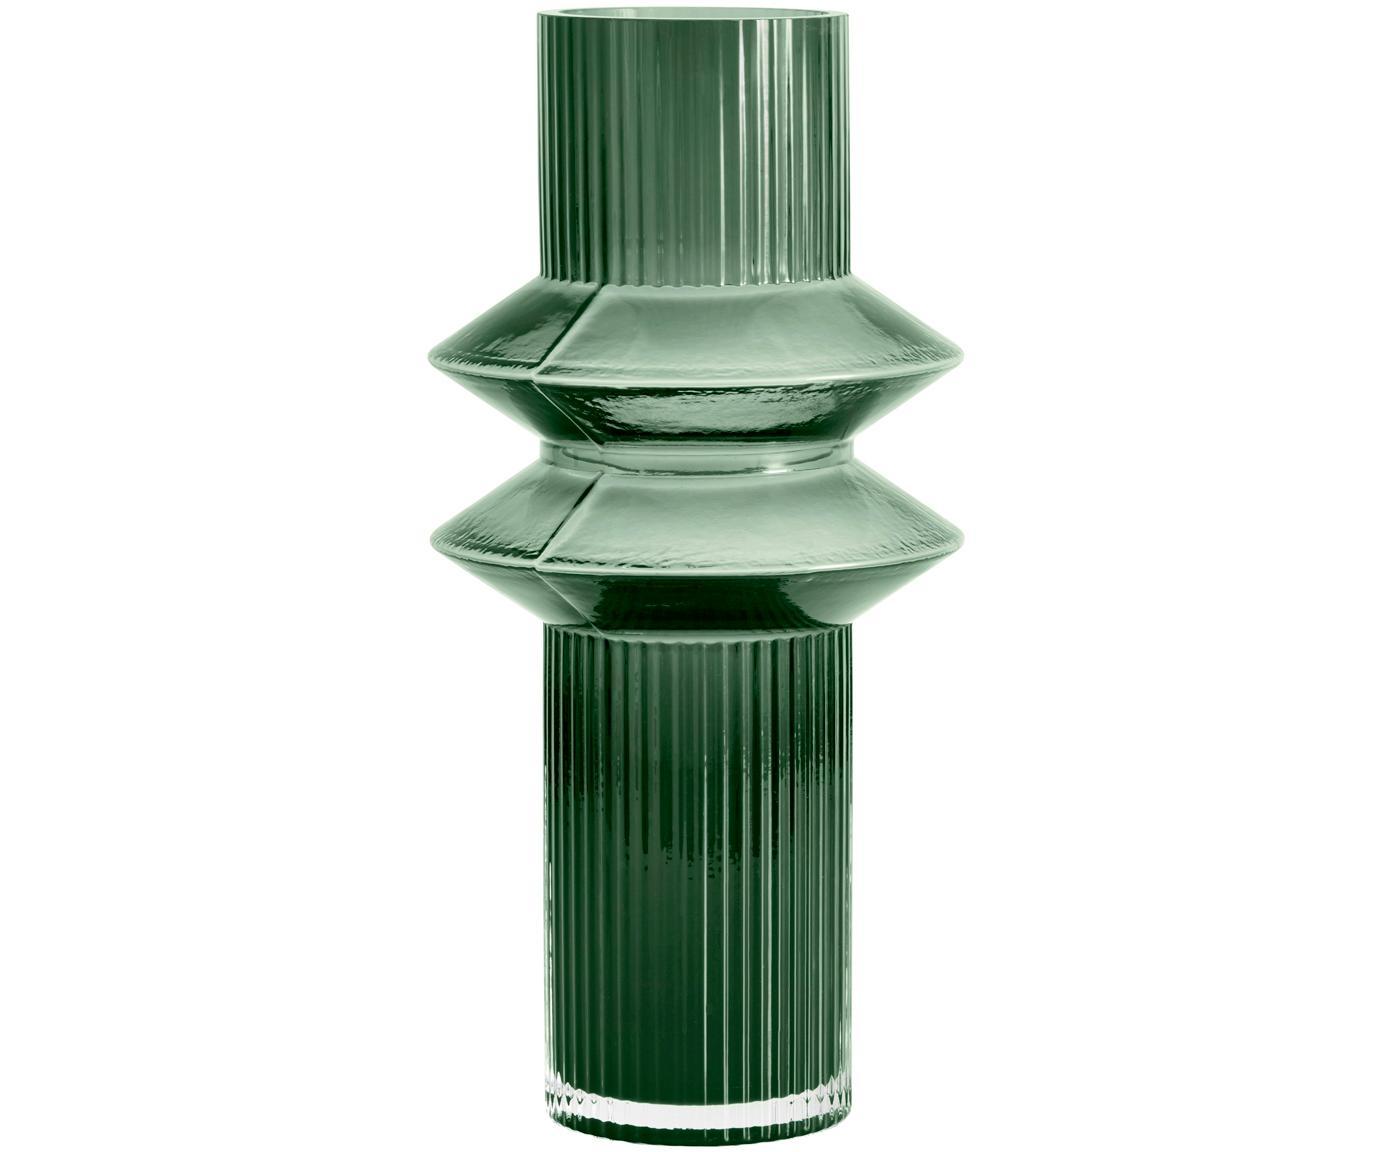 Grosse Glas-Vase Rilla, Glas, Grün, Ø 9 x H 32 cm